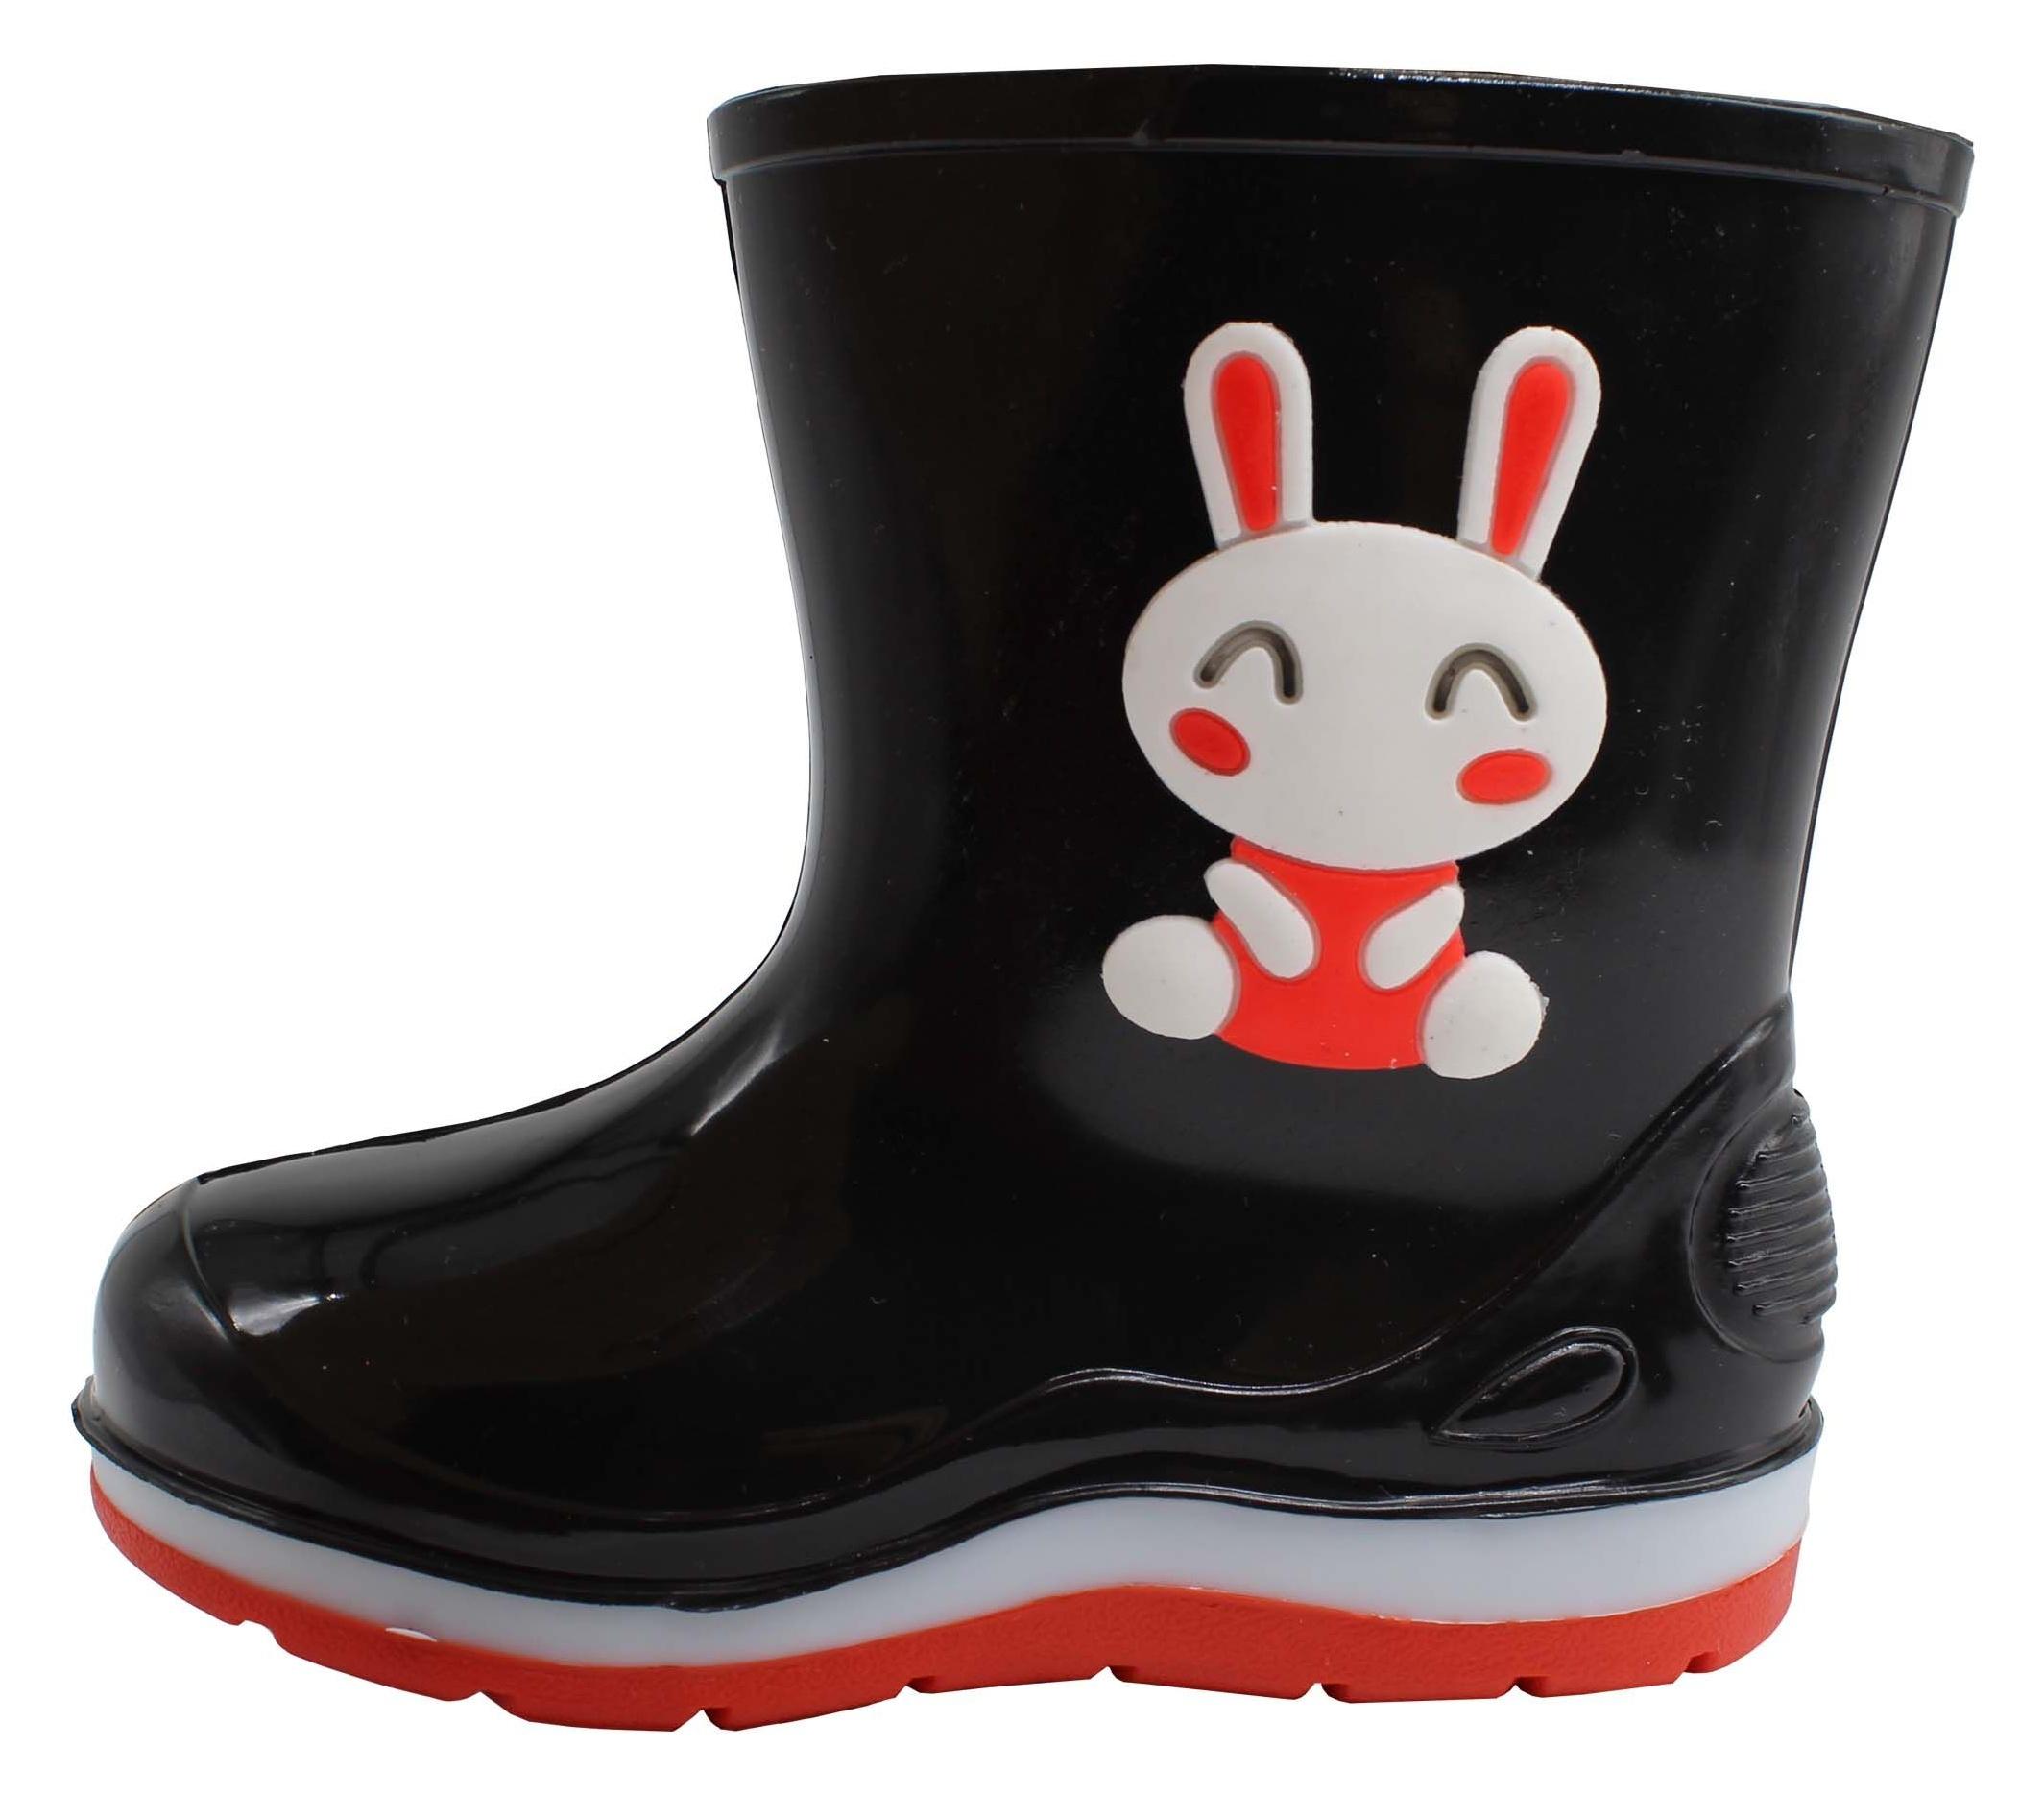 بوت دخترانه طرح خرگوش کد K1-1229-BK-RD